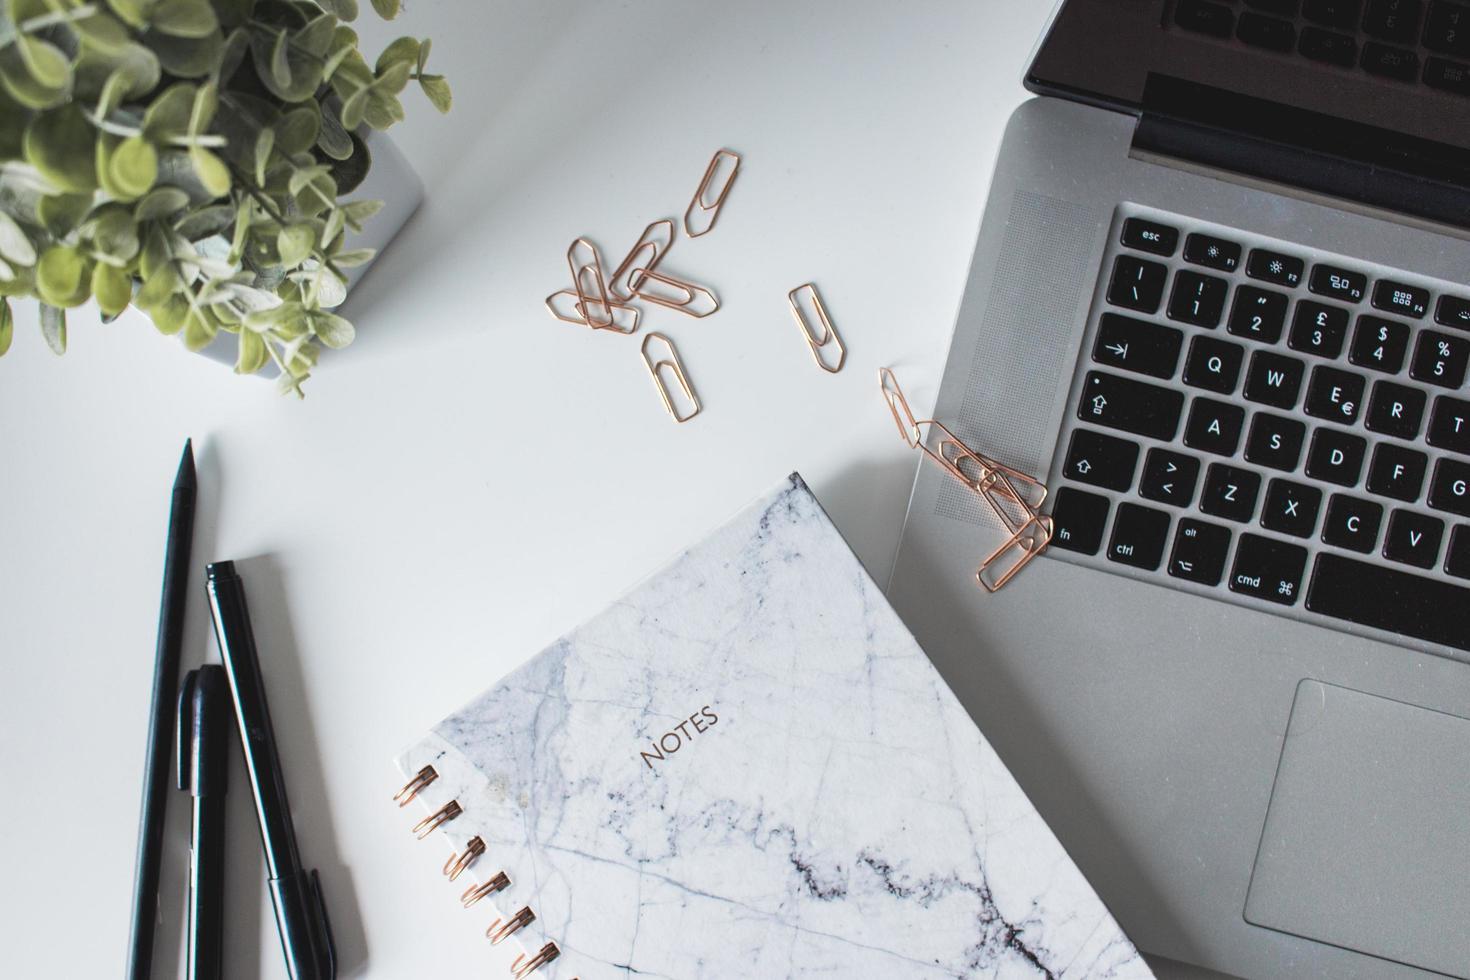 bureau met laptop, notitieboekje, pen, plant en paperclip foto